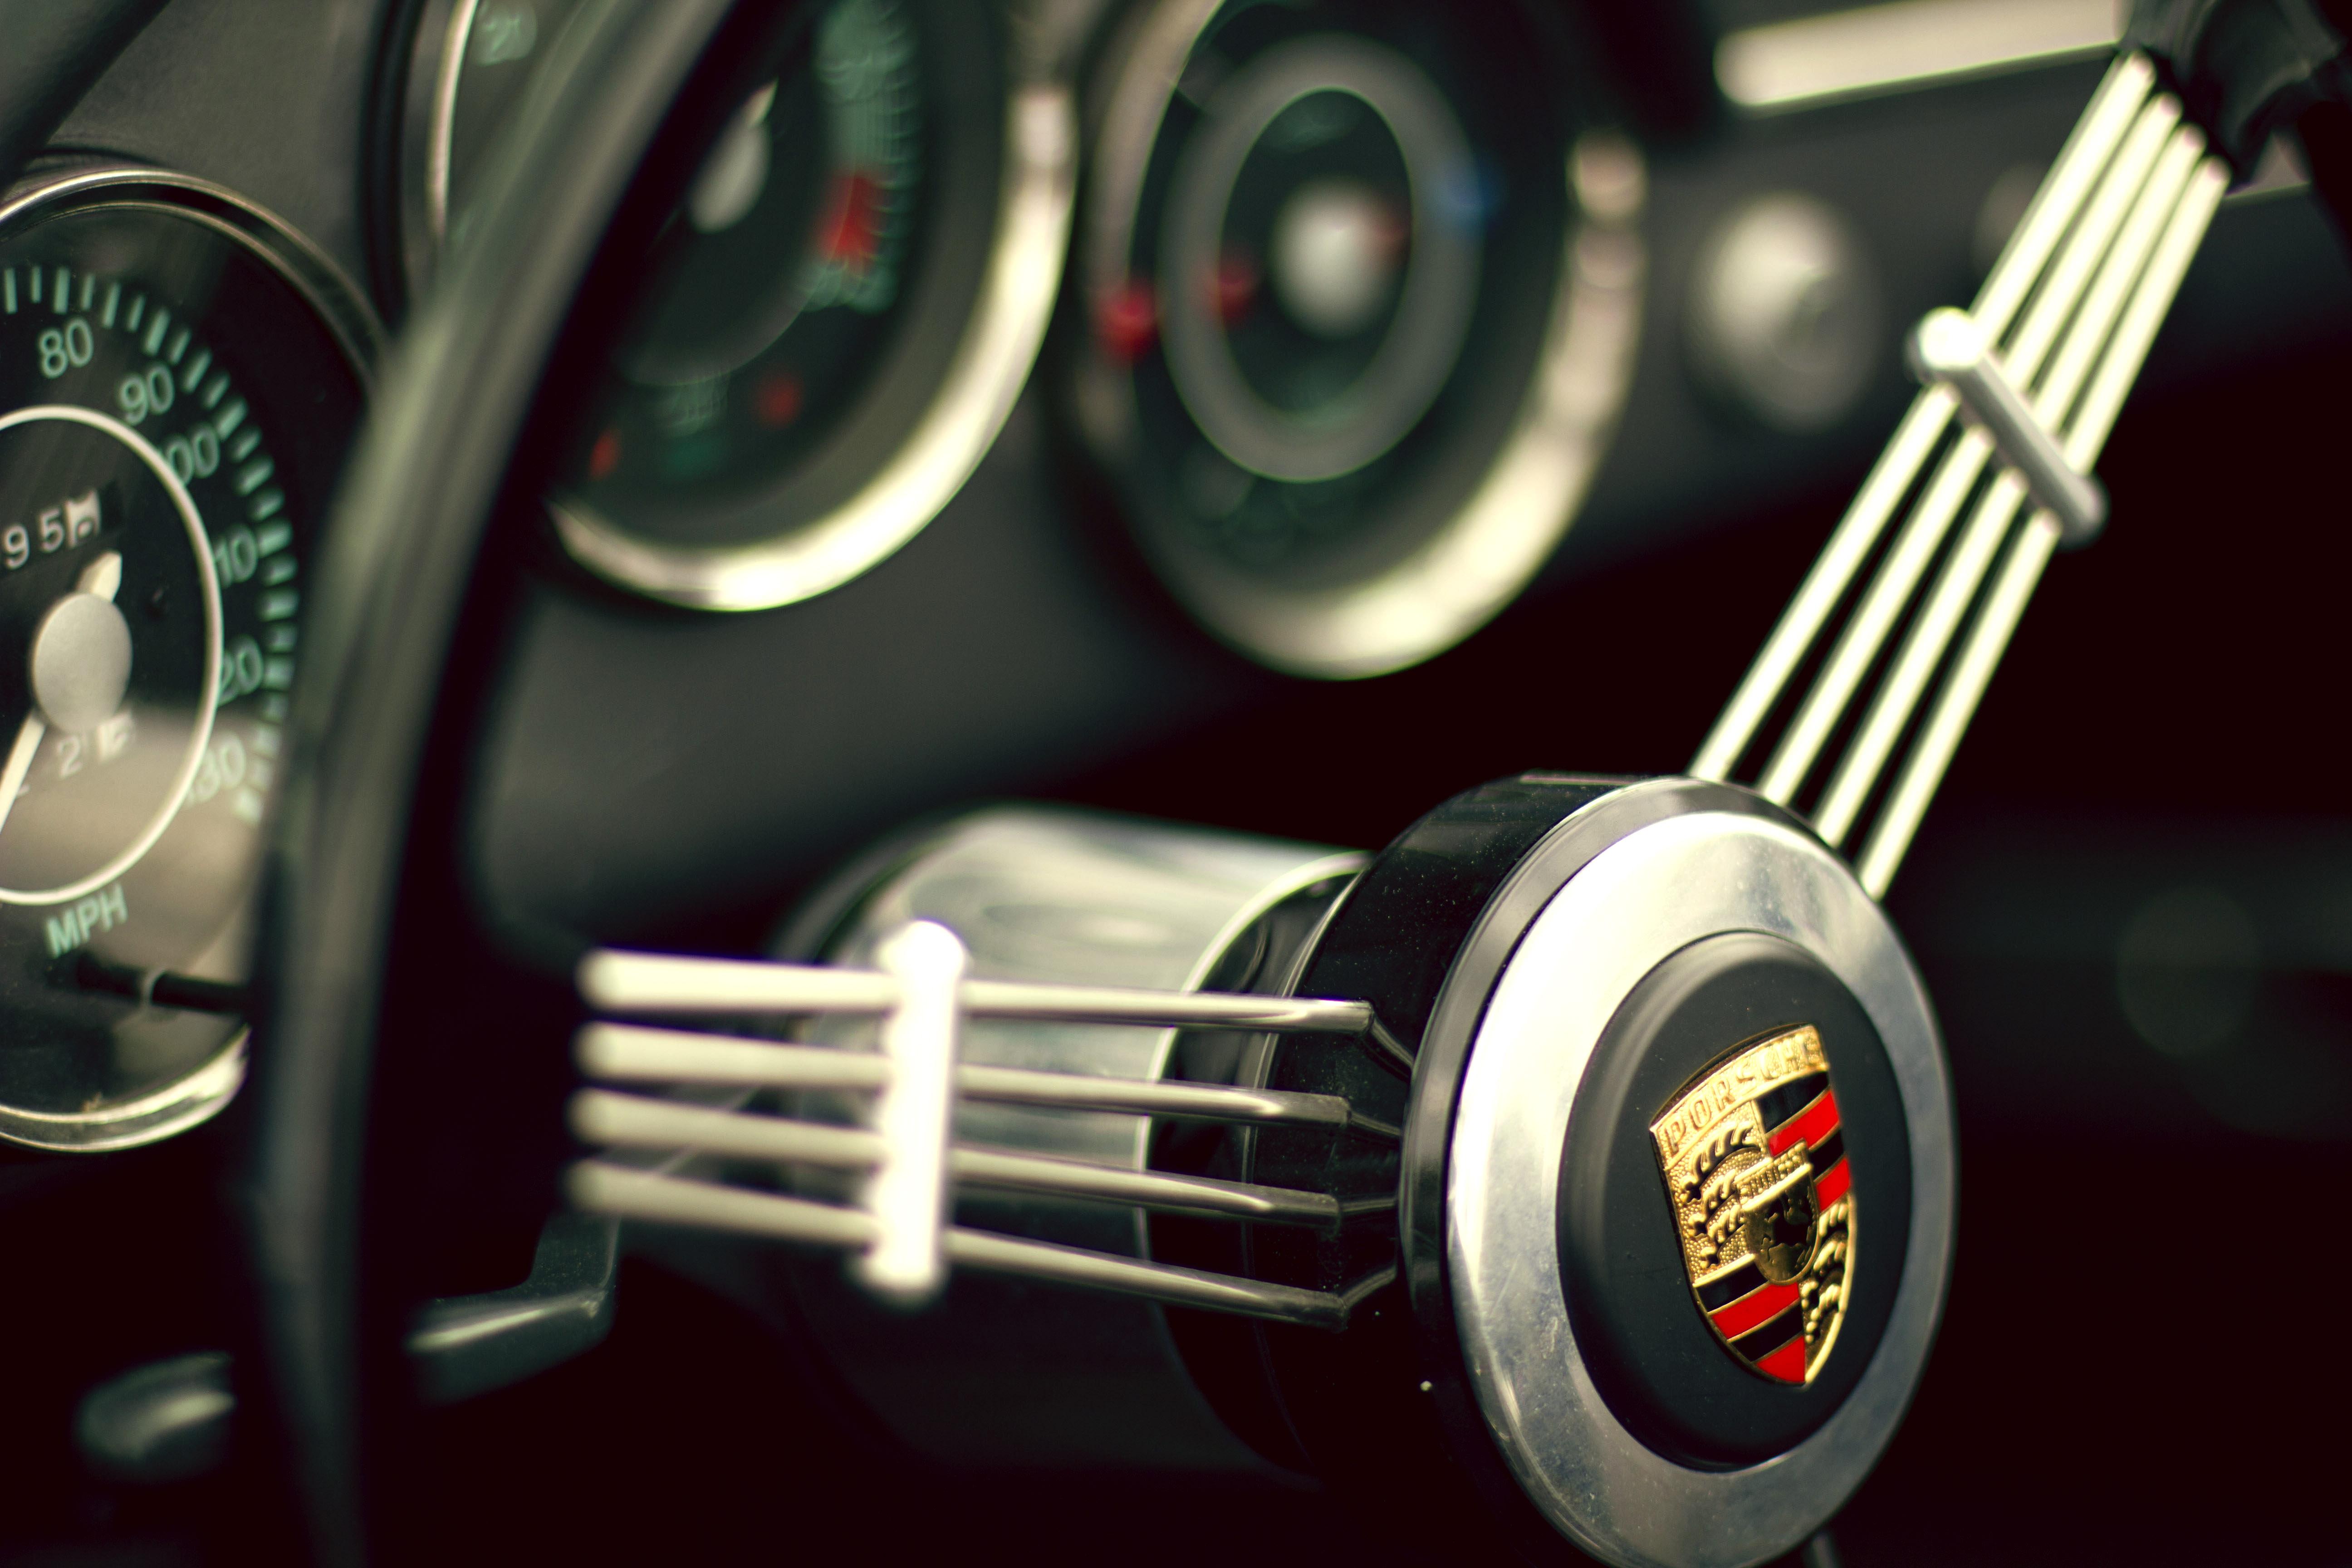 Classic Porsche By Projektpm On Deviantart